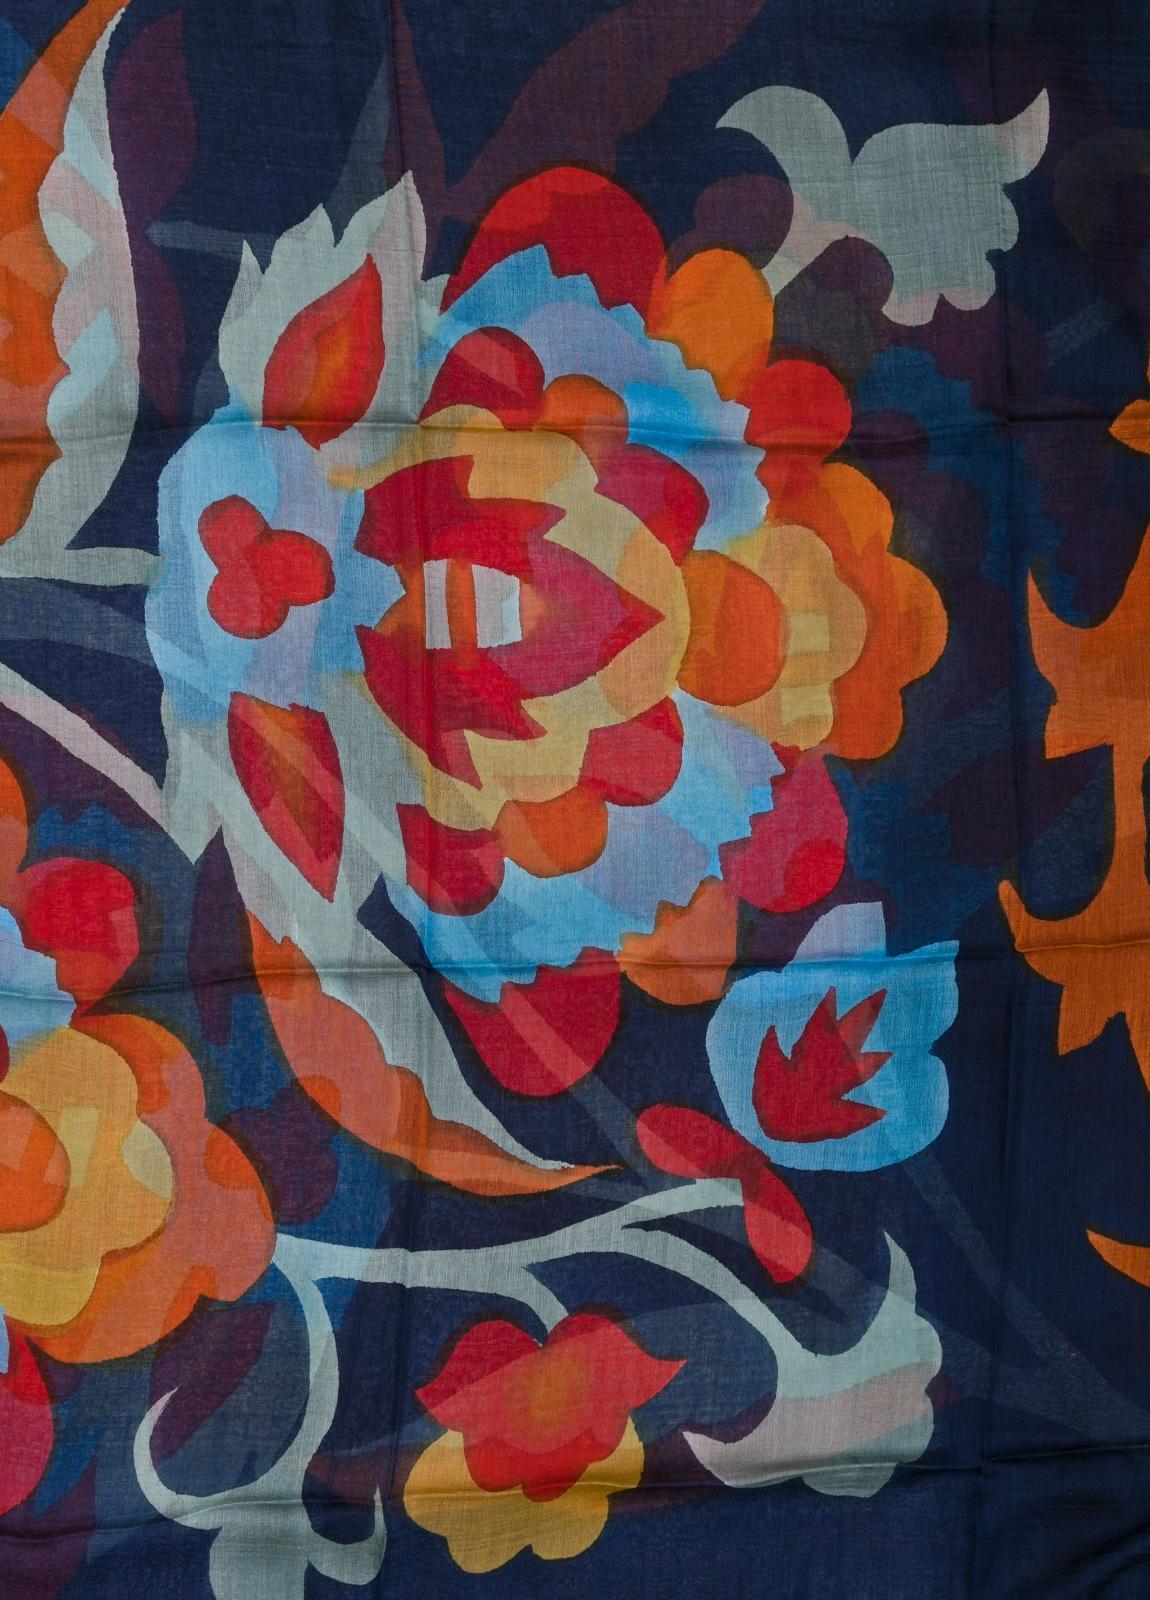 Foulard estampado floral color azul marino modelo MARGHERITA 100 x 190 cm. 70% Modal 30% Seda. - Ítem1